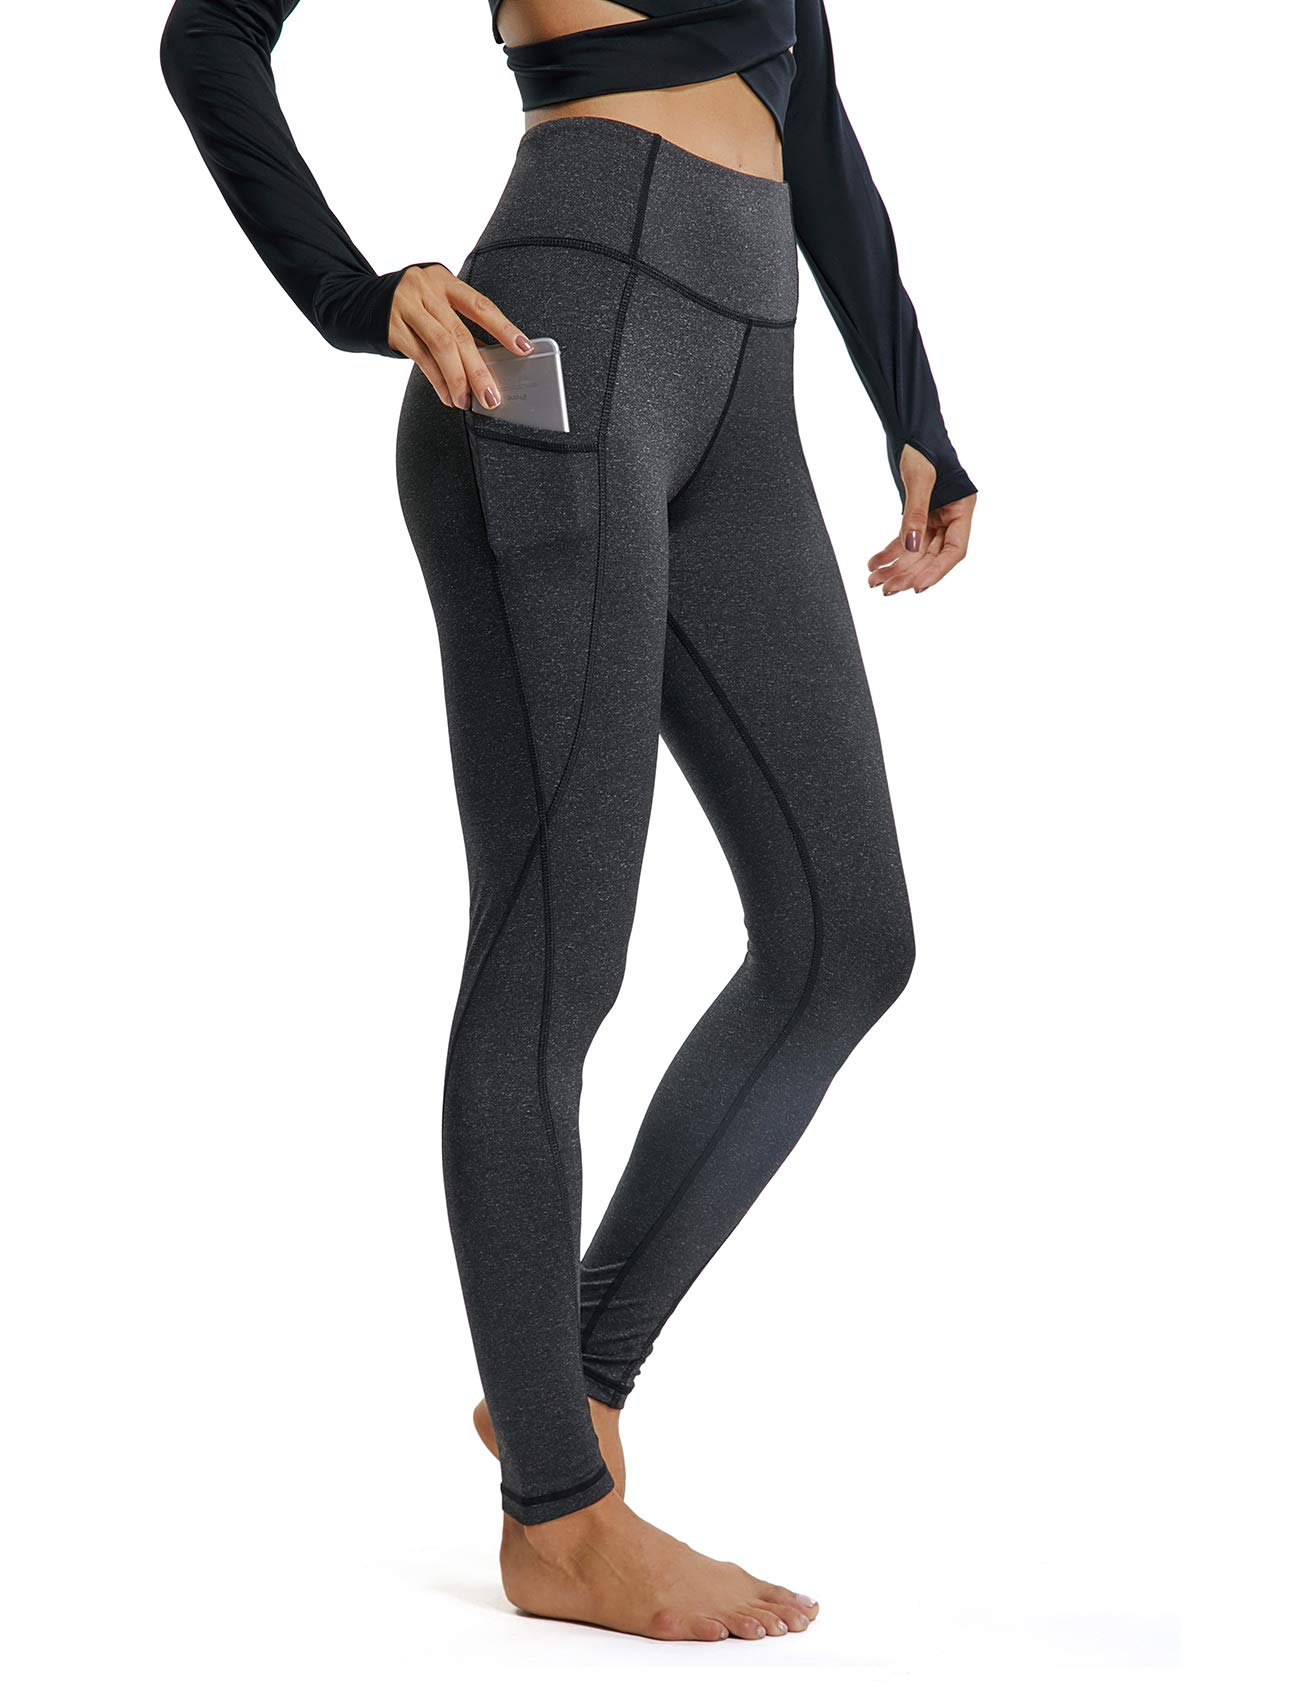 Women Scrunch Butt Yoga Leggings with Pockets Butt Lift Booty Leggings Tummy Control Workout Pants Flattering Gym Tight L